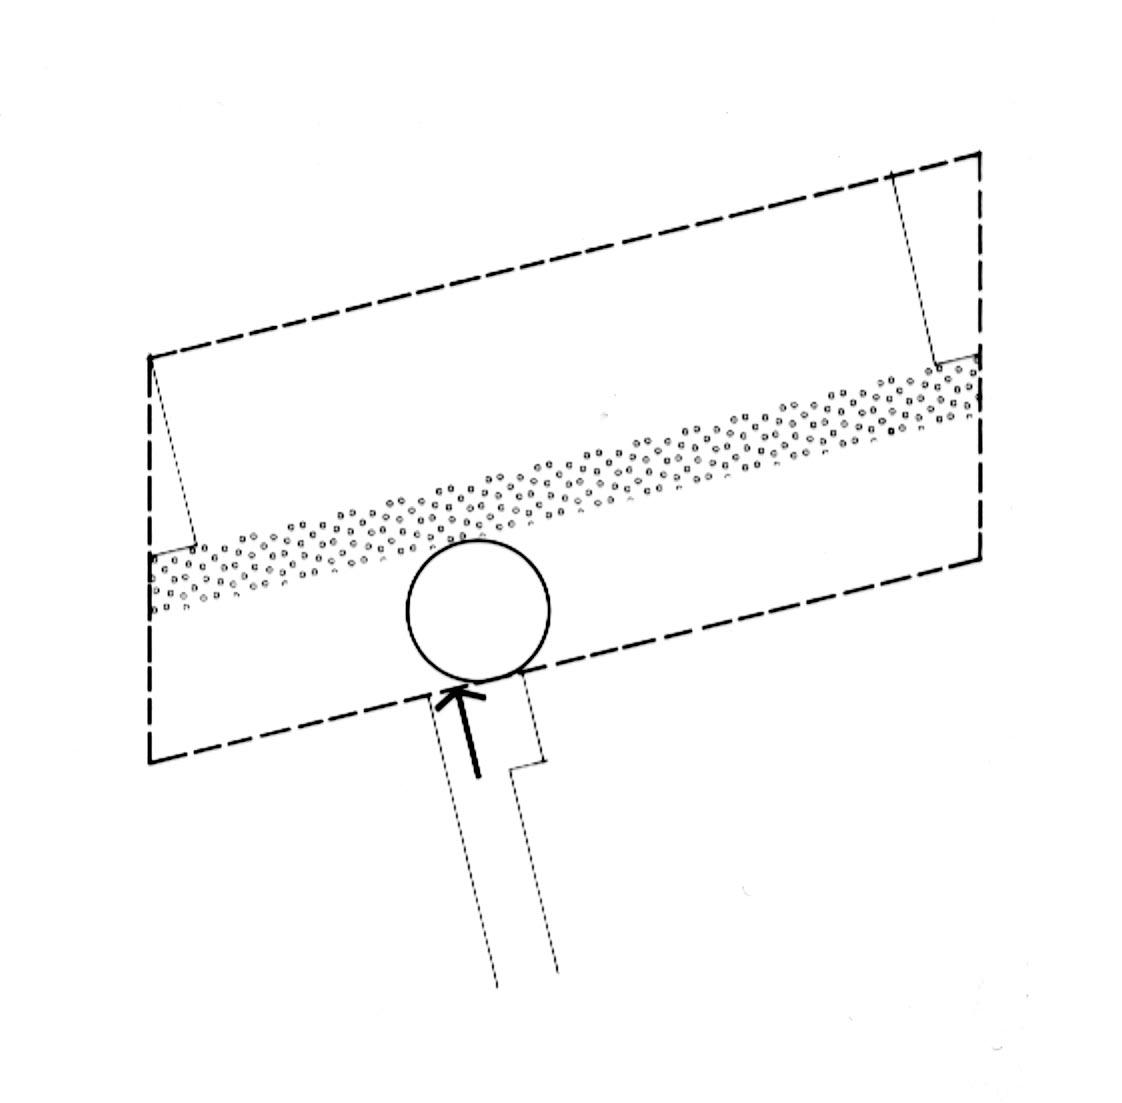 marshall-circulation diag.B.jpg